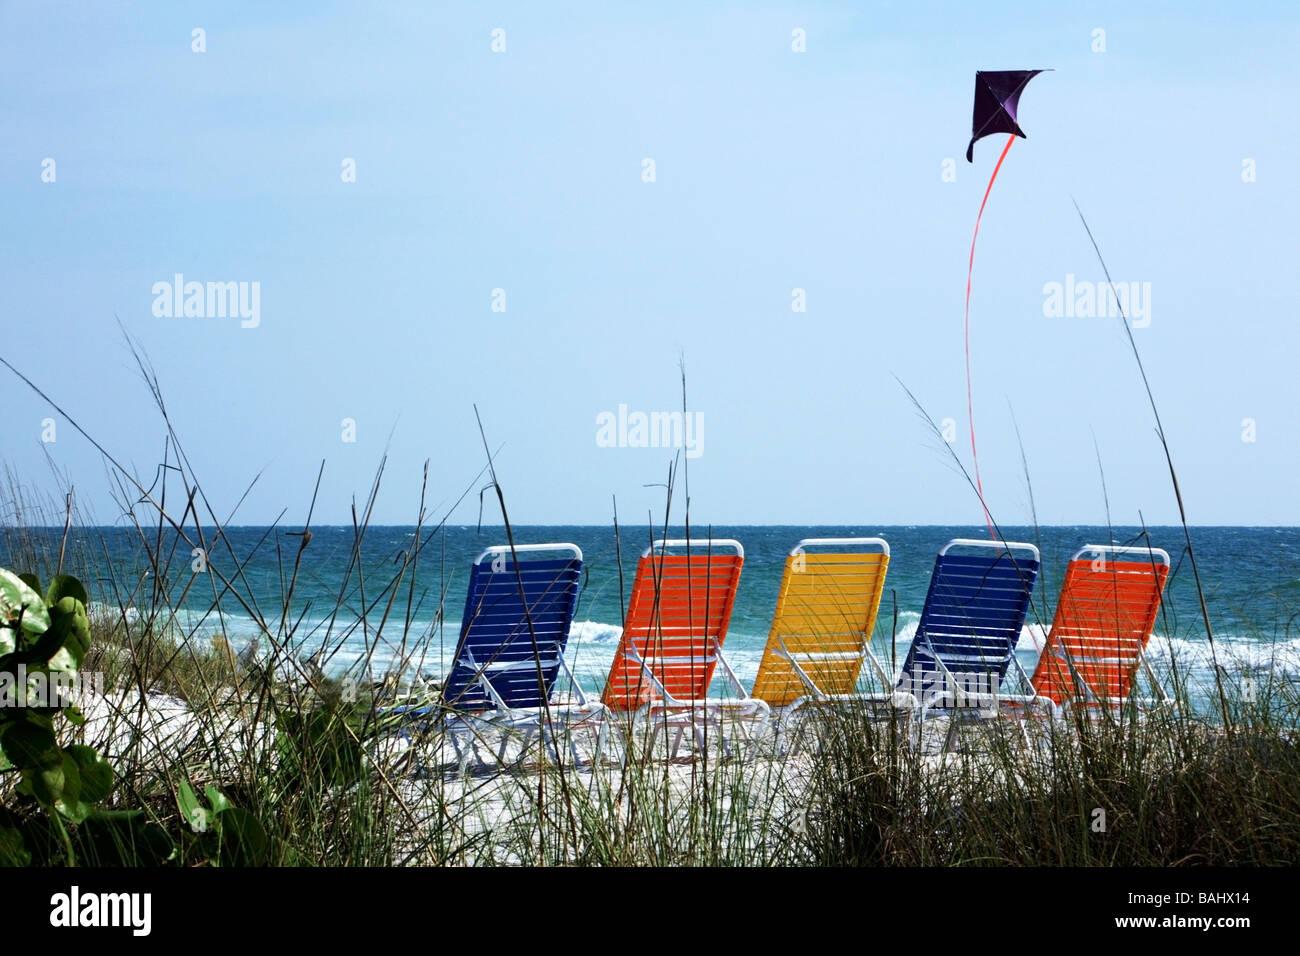 Bradenton Beach, Florida, USA; Beach chairs lined on beach and a kite flying - Stock Image